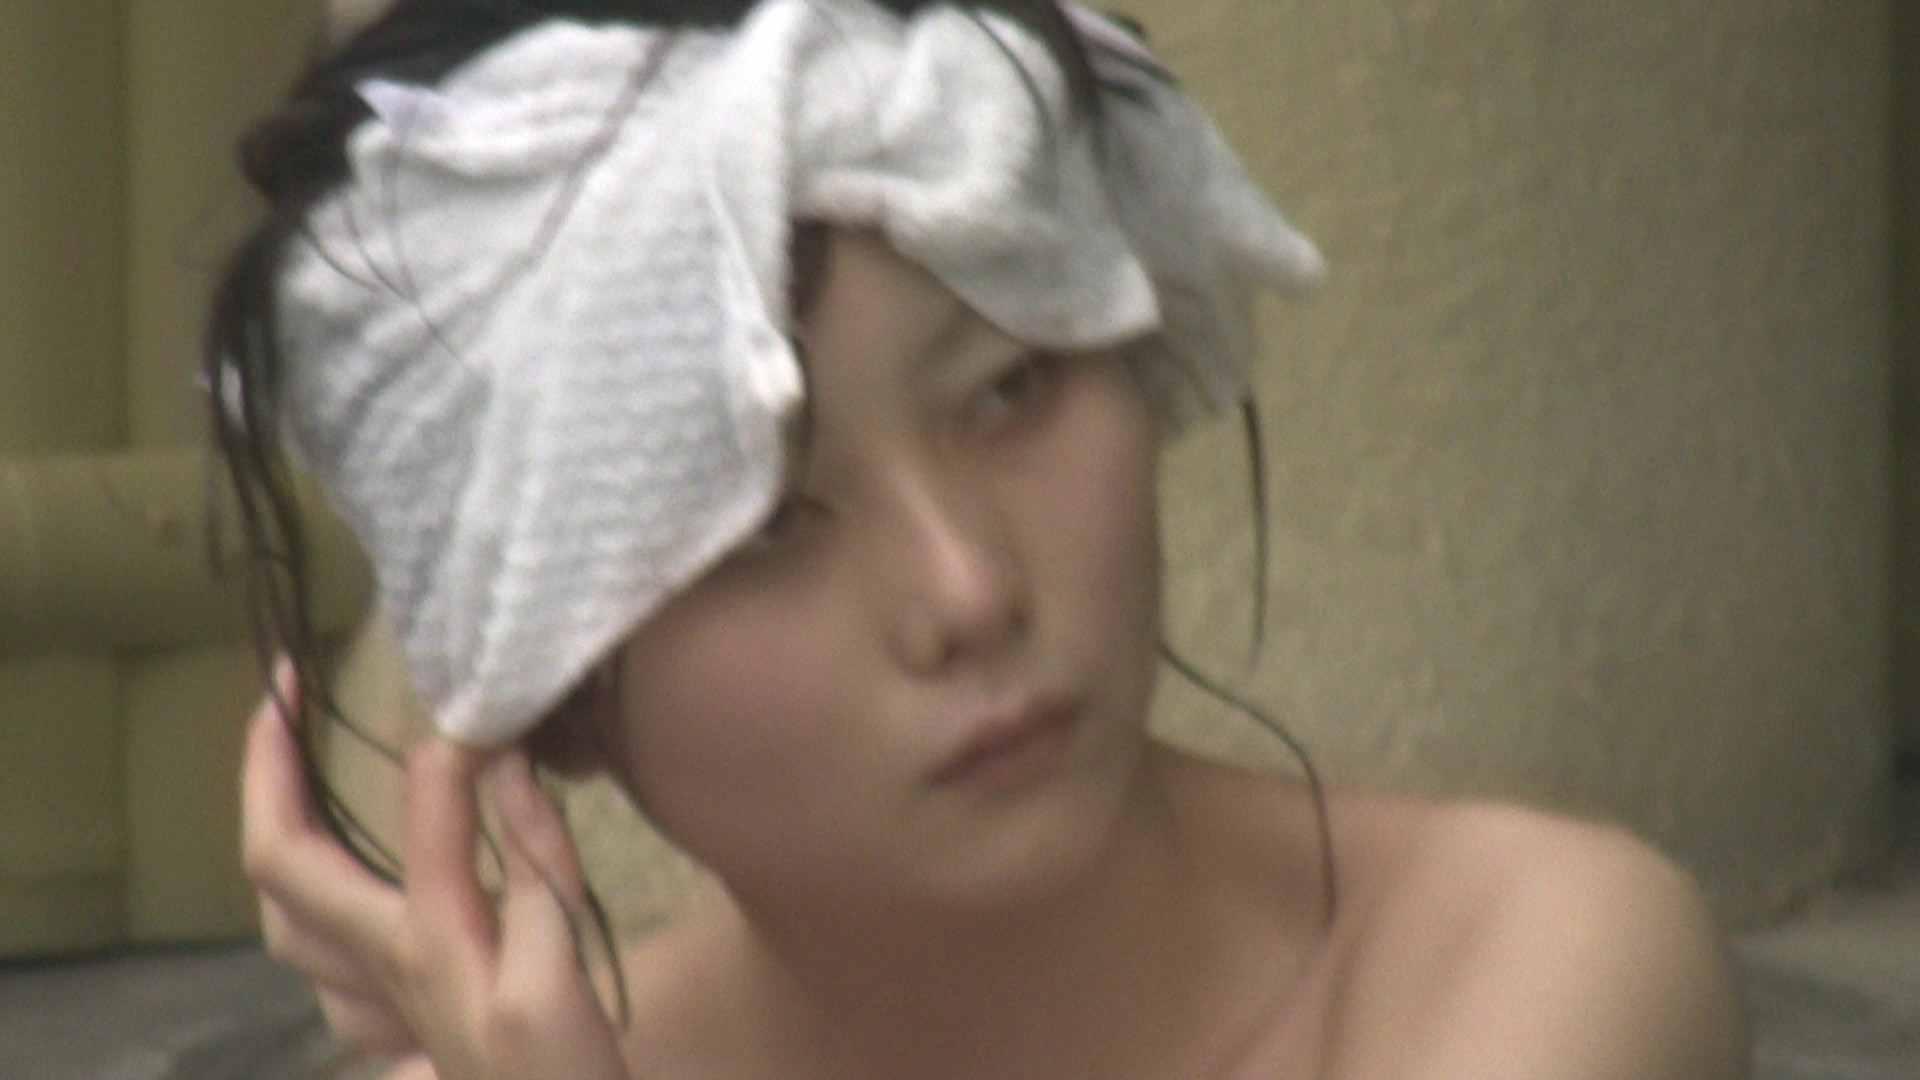 Aquaな露天風呂Vol.147 盗撮 | OLセックス  85画像 73